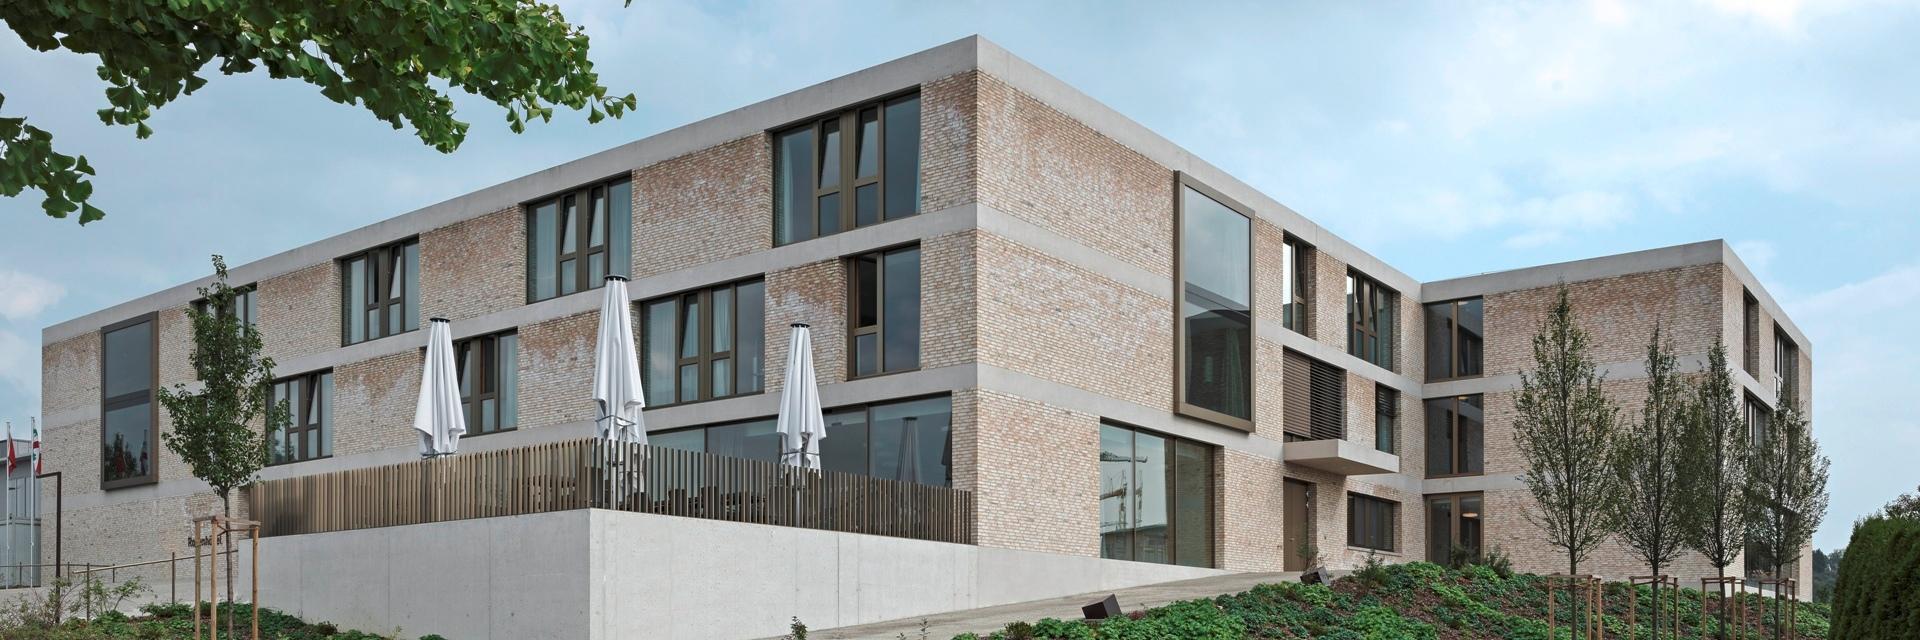 Residenza per anziani Rosenhügel